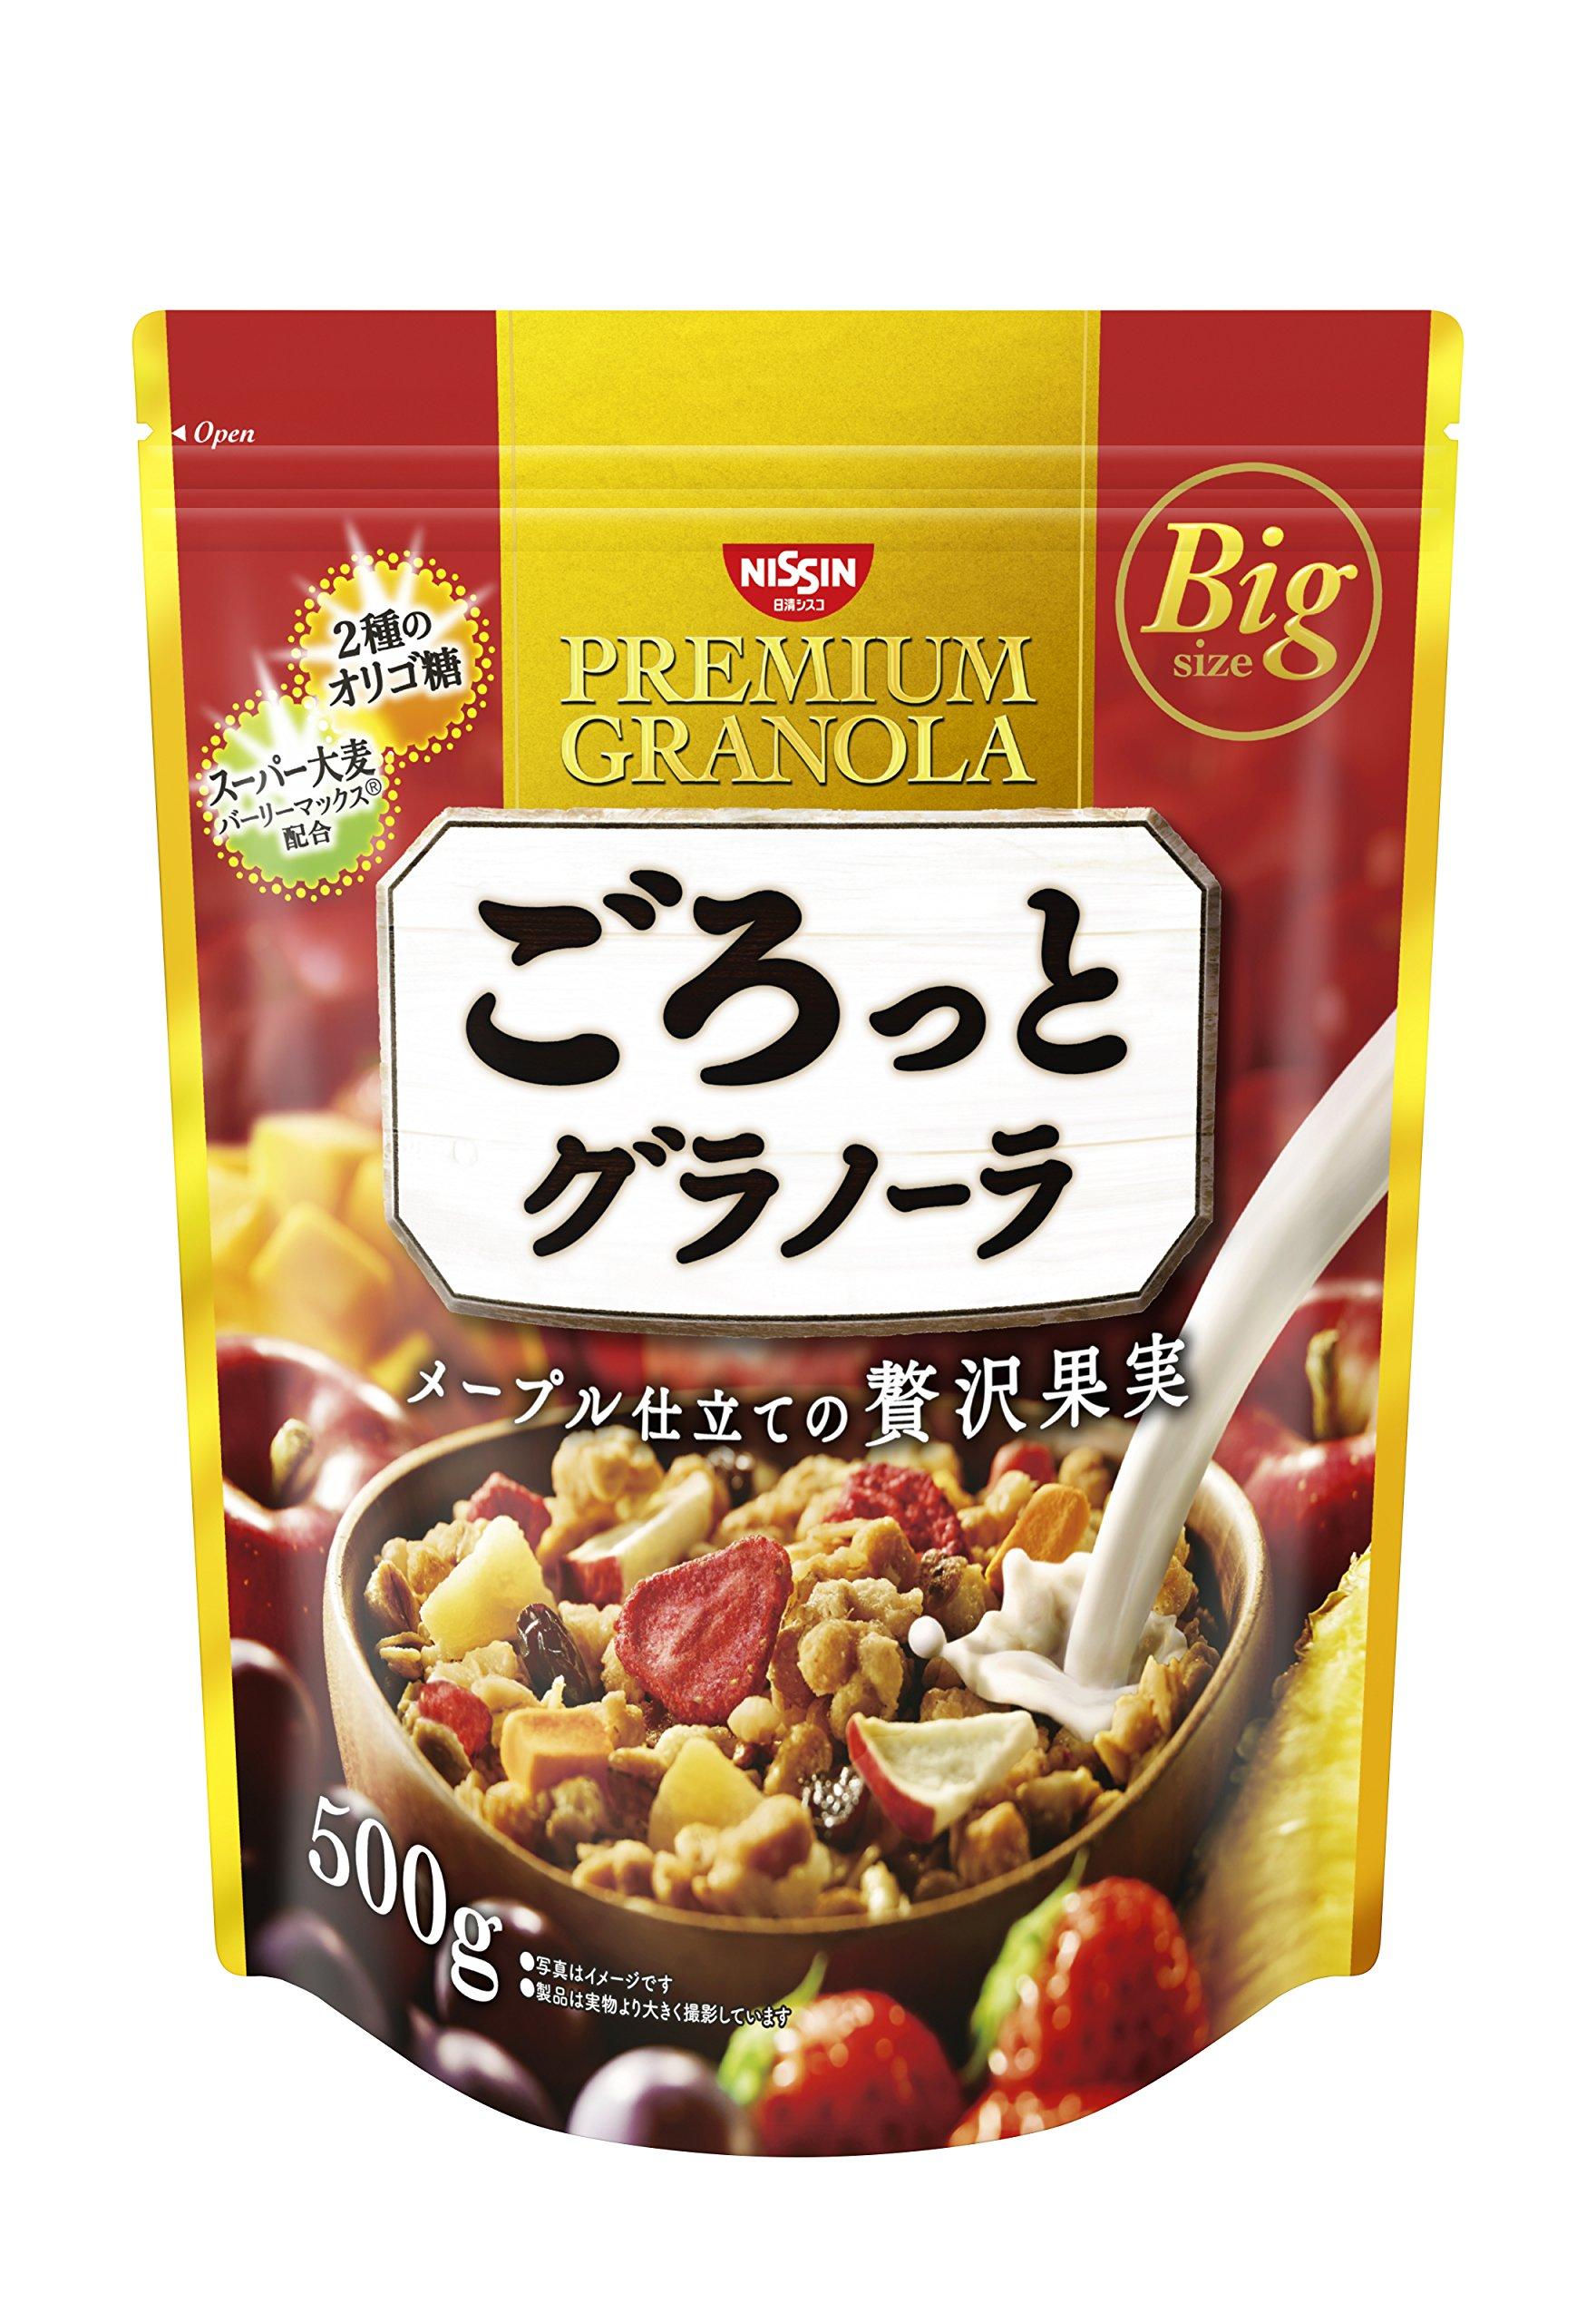 Nisshin Cisco Gorotto granola luxury fruit 500gX6 bags